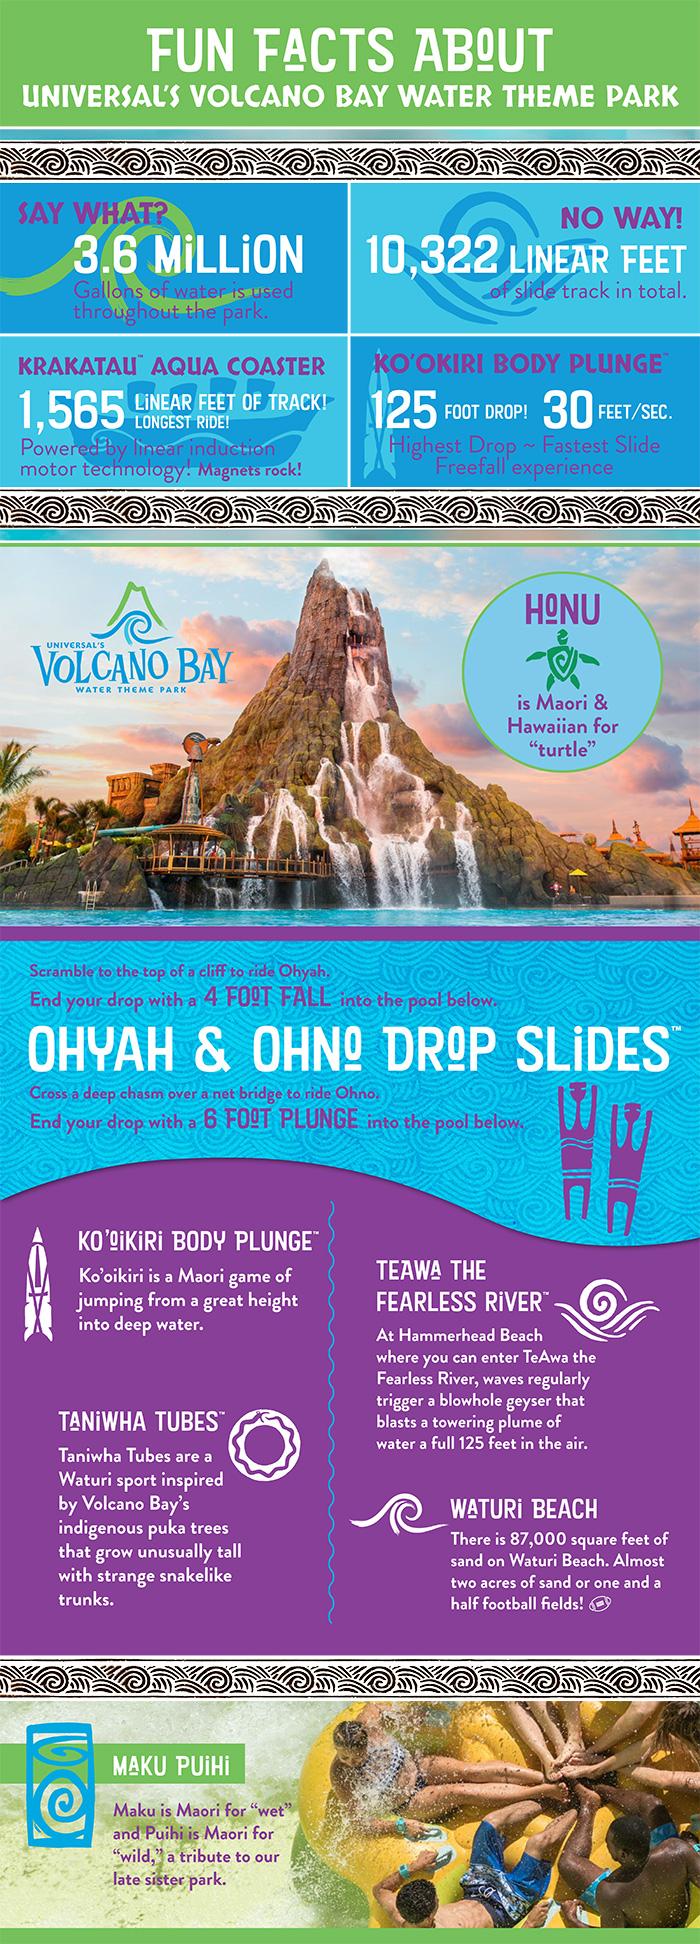 Volcano Bay Infographic